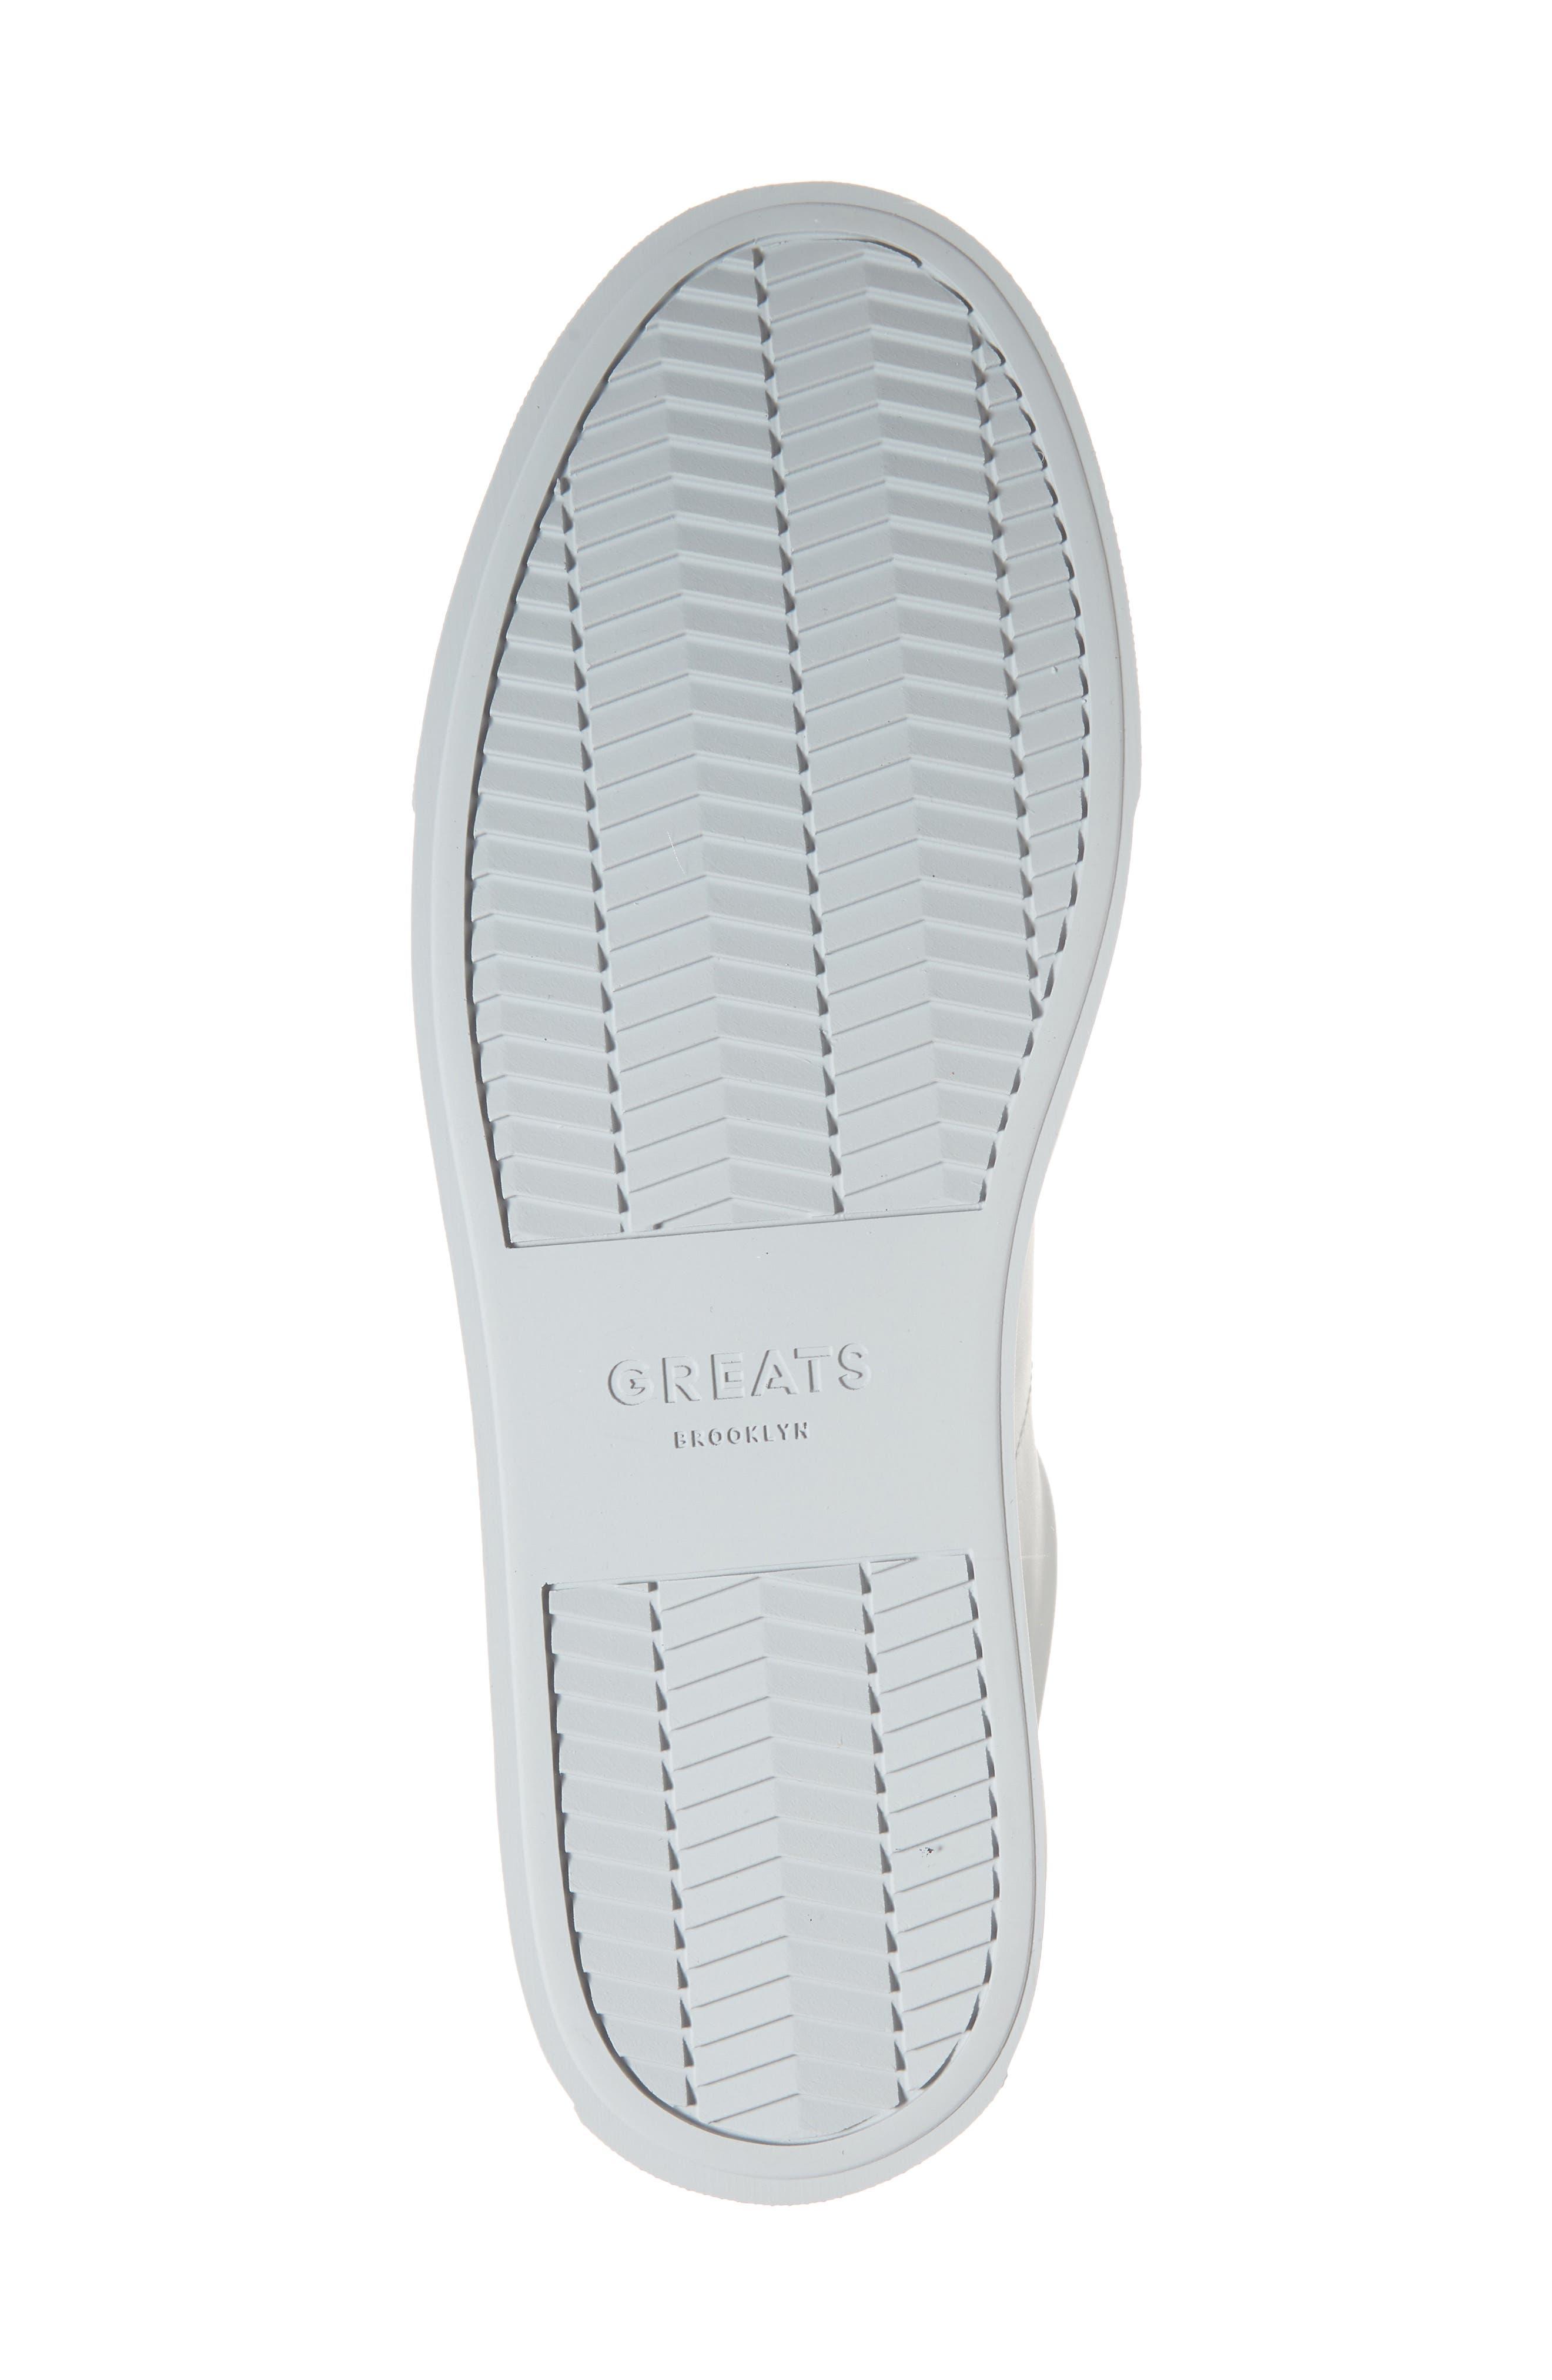 Royale Sneaker,                             Alternate thumbnail 6, color,                             Grey Tonal Leather